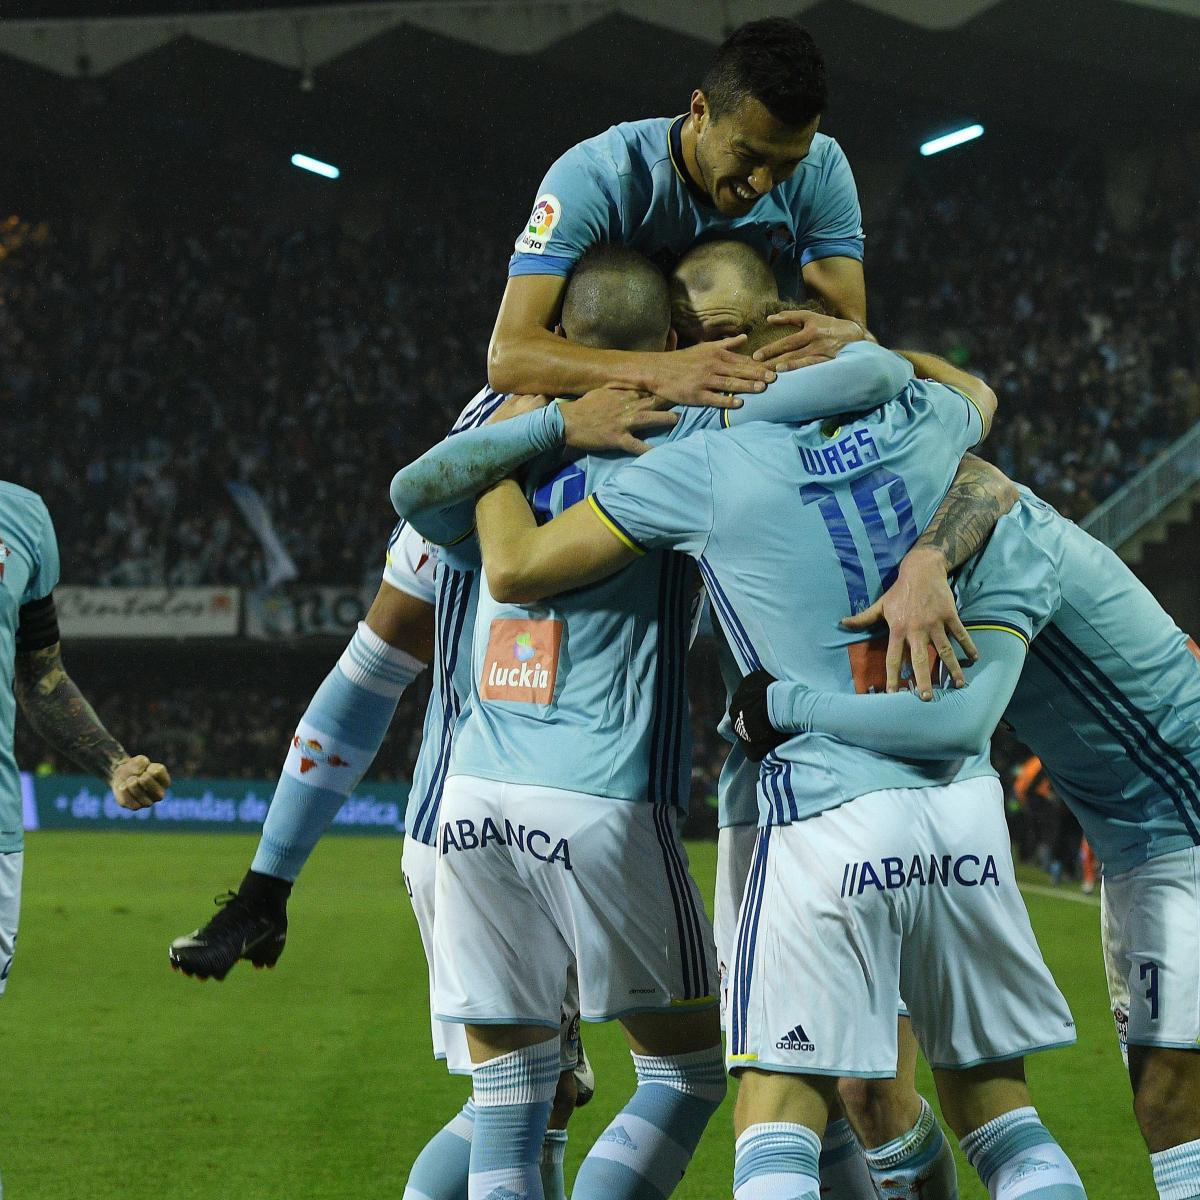 Celta Vigo Vs Barcelona Predictions Today: Celta Vigo Vs. Alaves: 2017 Spanish Copa Del Rey Leg 1